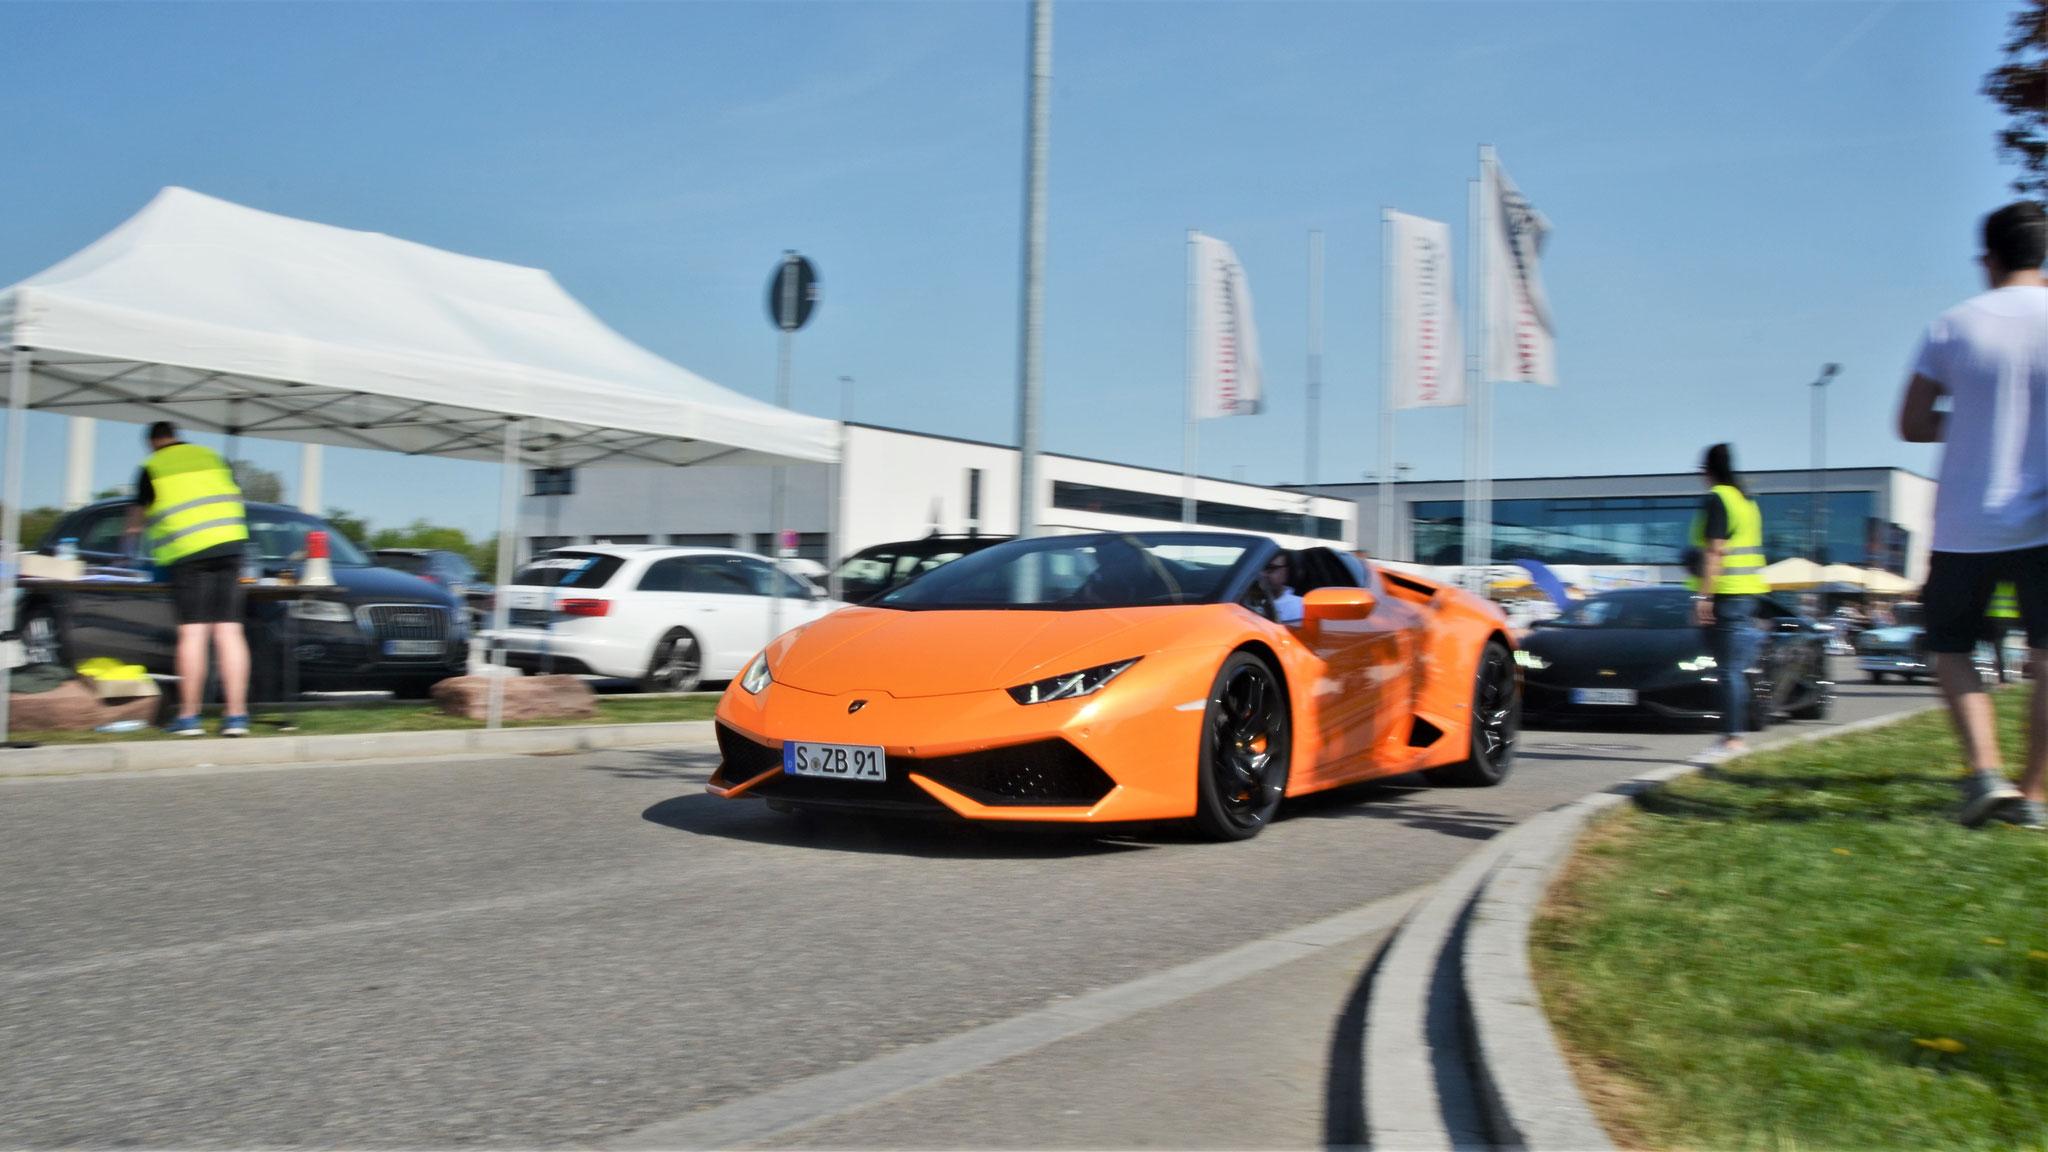 Lamborghini Huracan Spyder - S-ZB-91